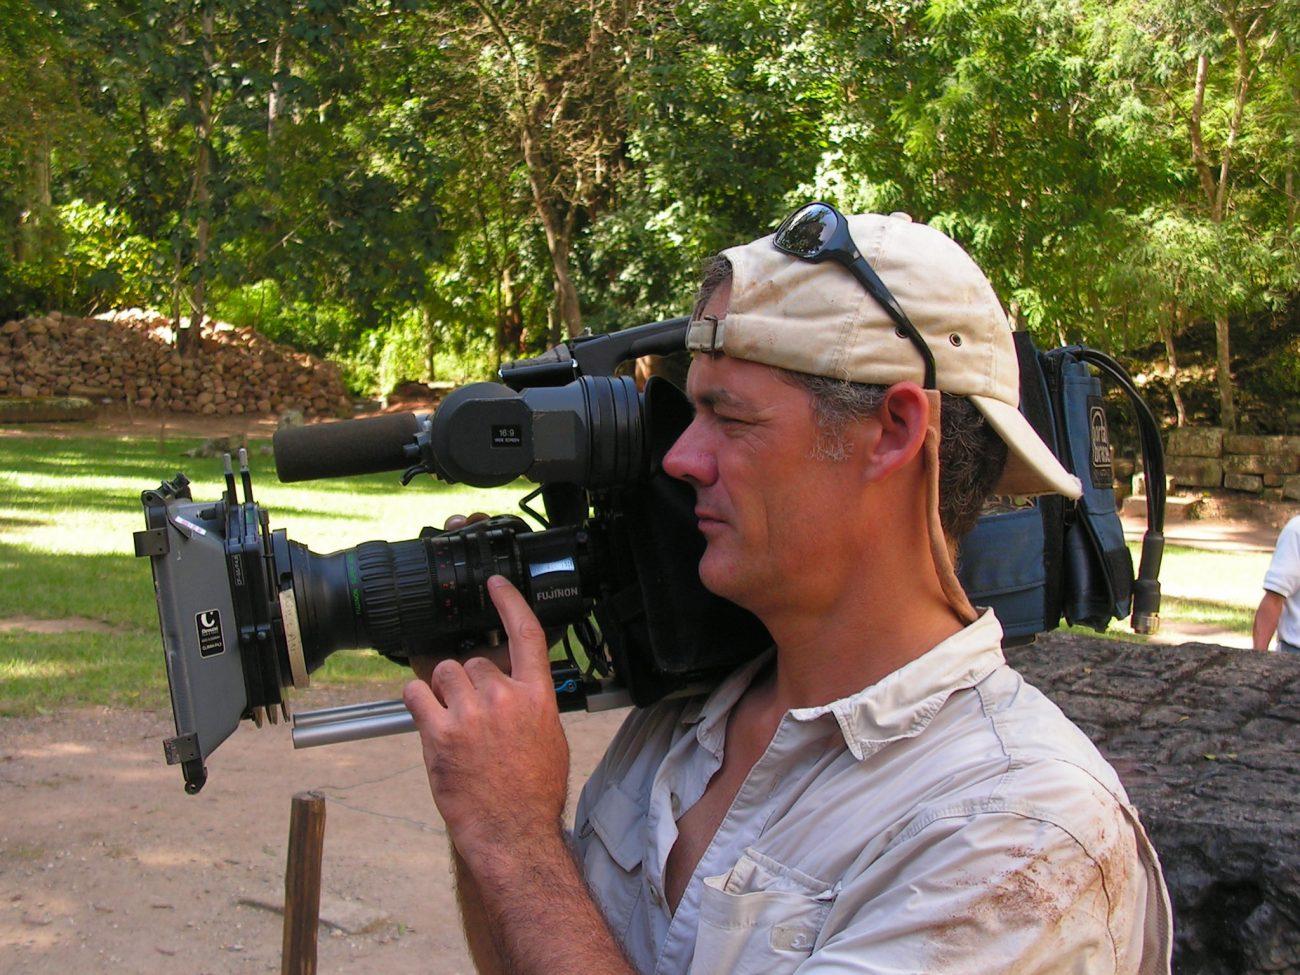 Kameramand ved Copán-ruinen